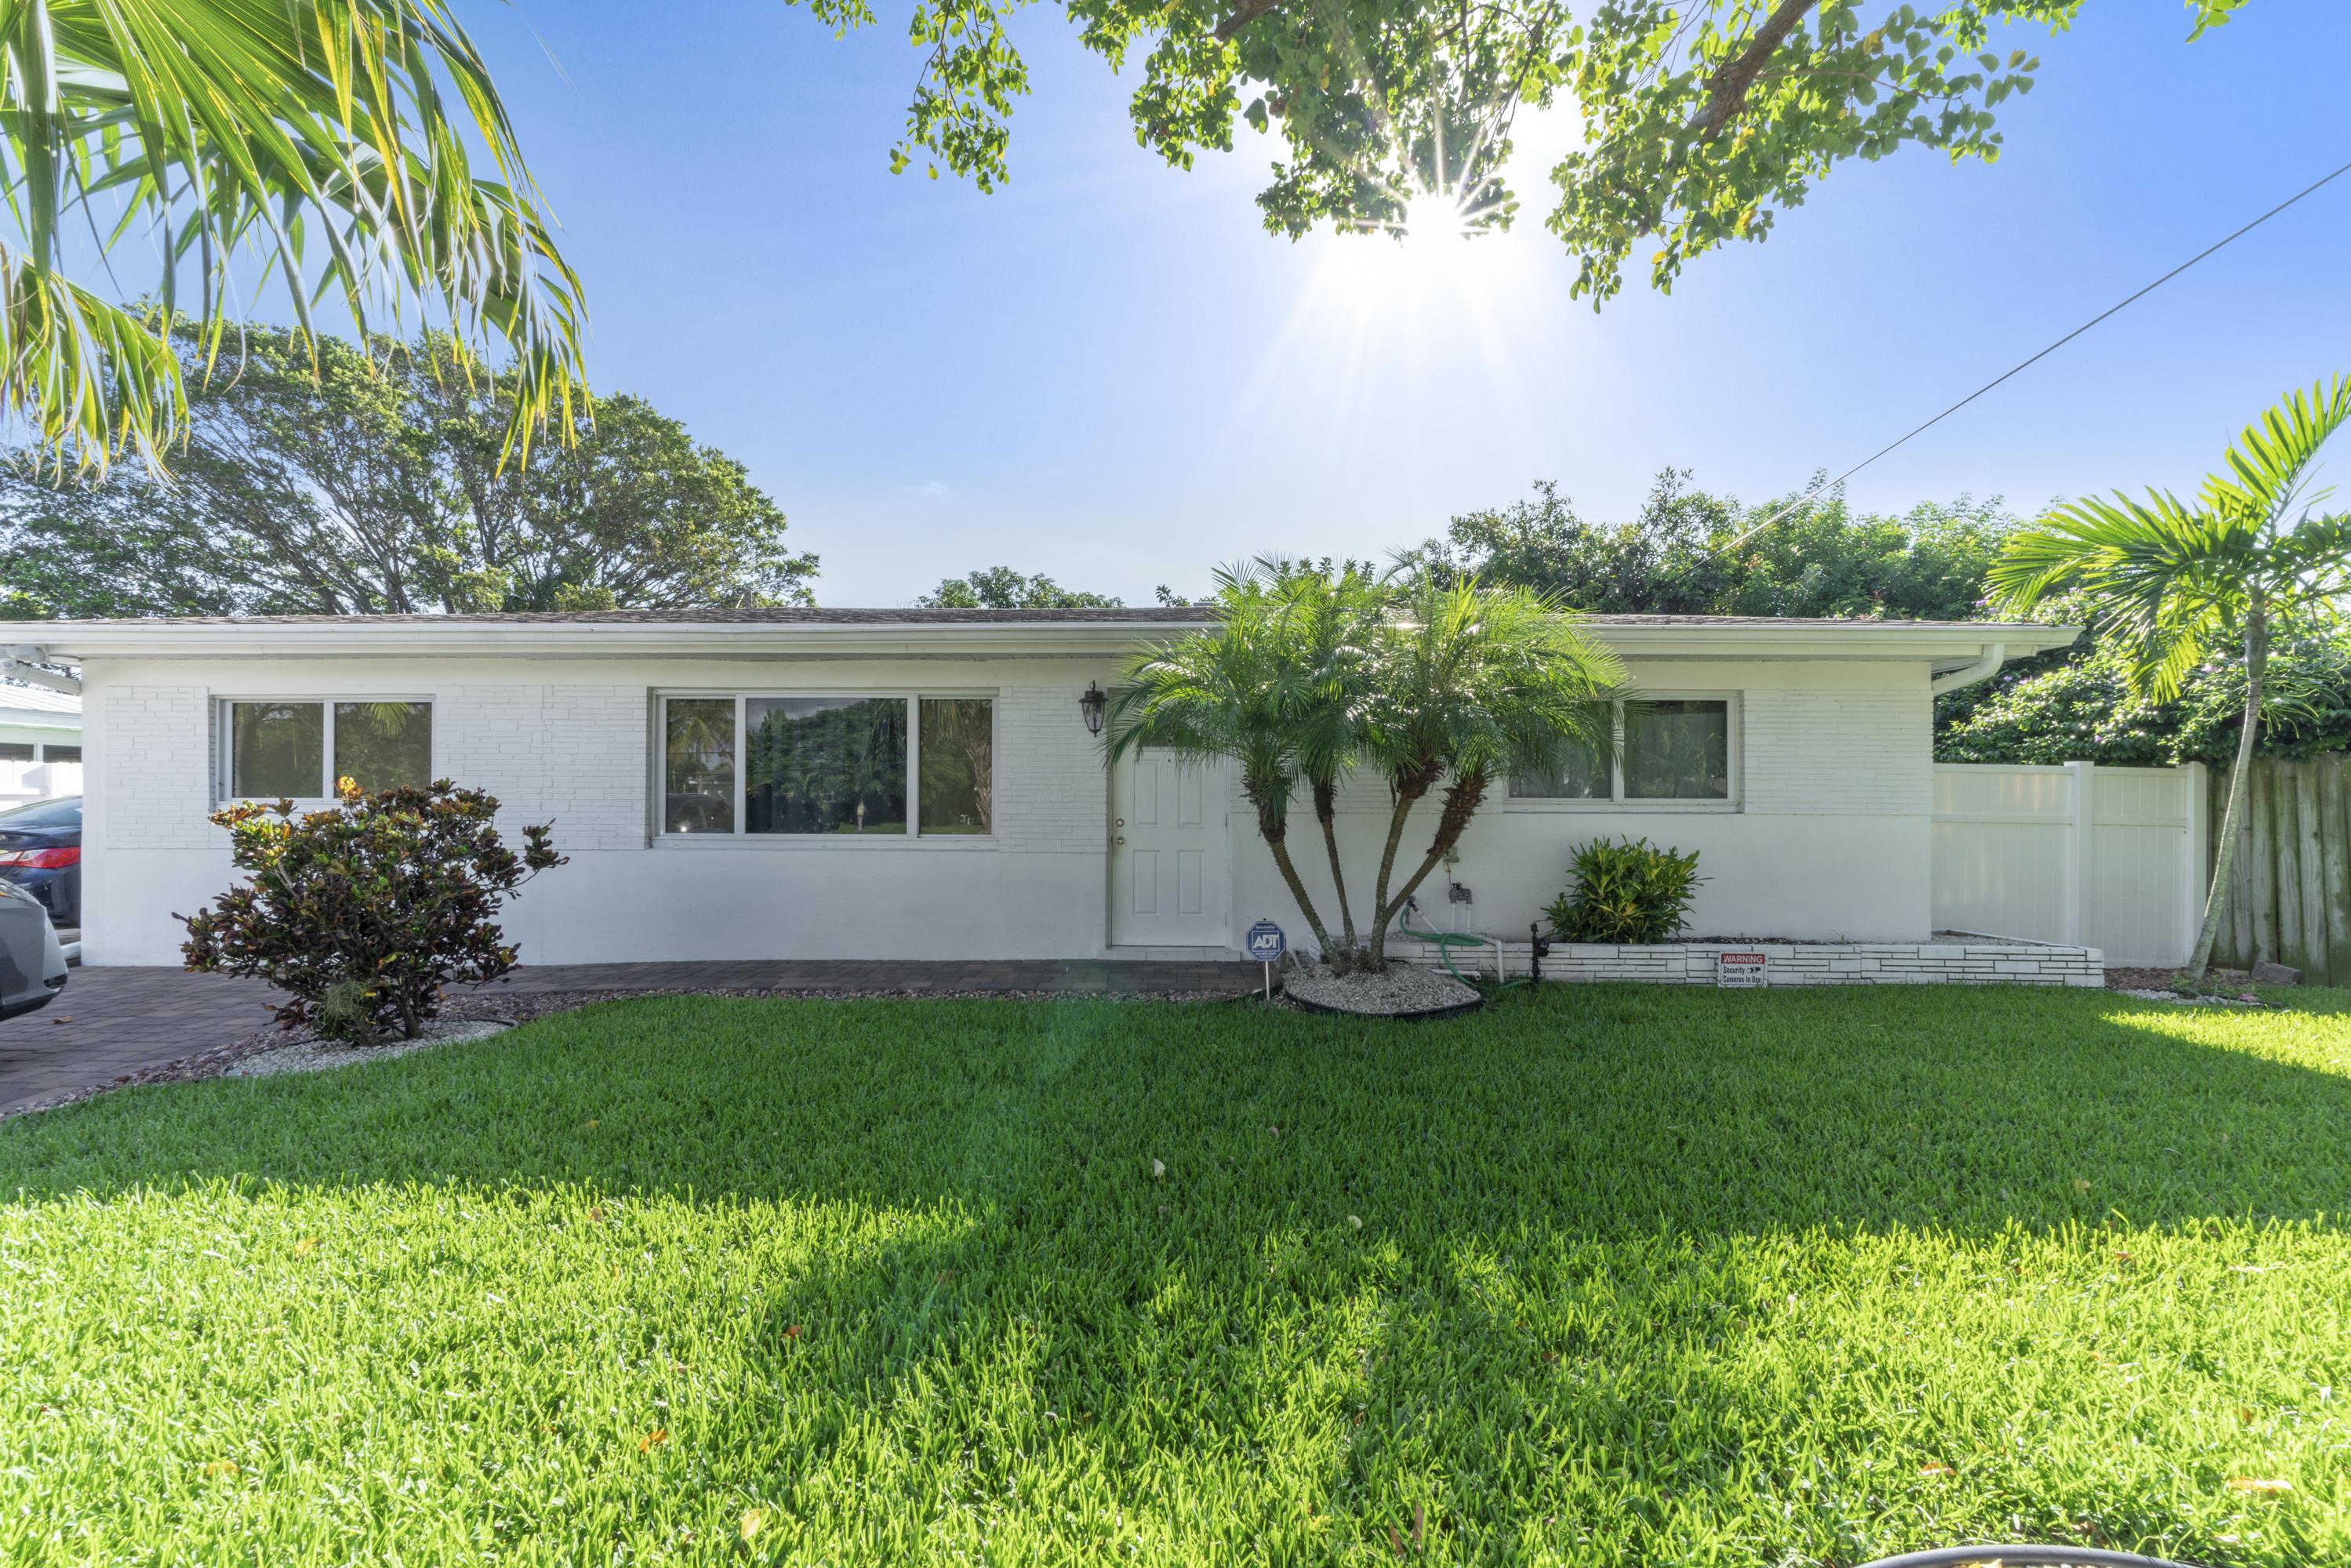 874 Nw 2nd Avenue, Boca Raton, FL 33432